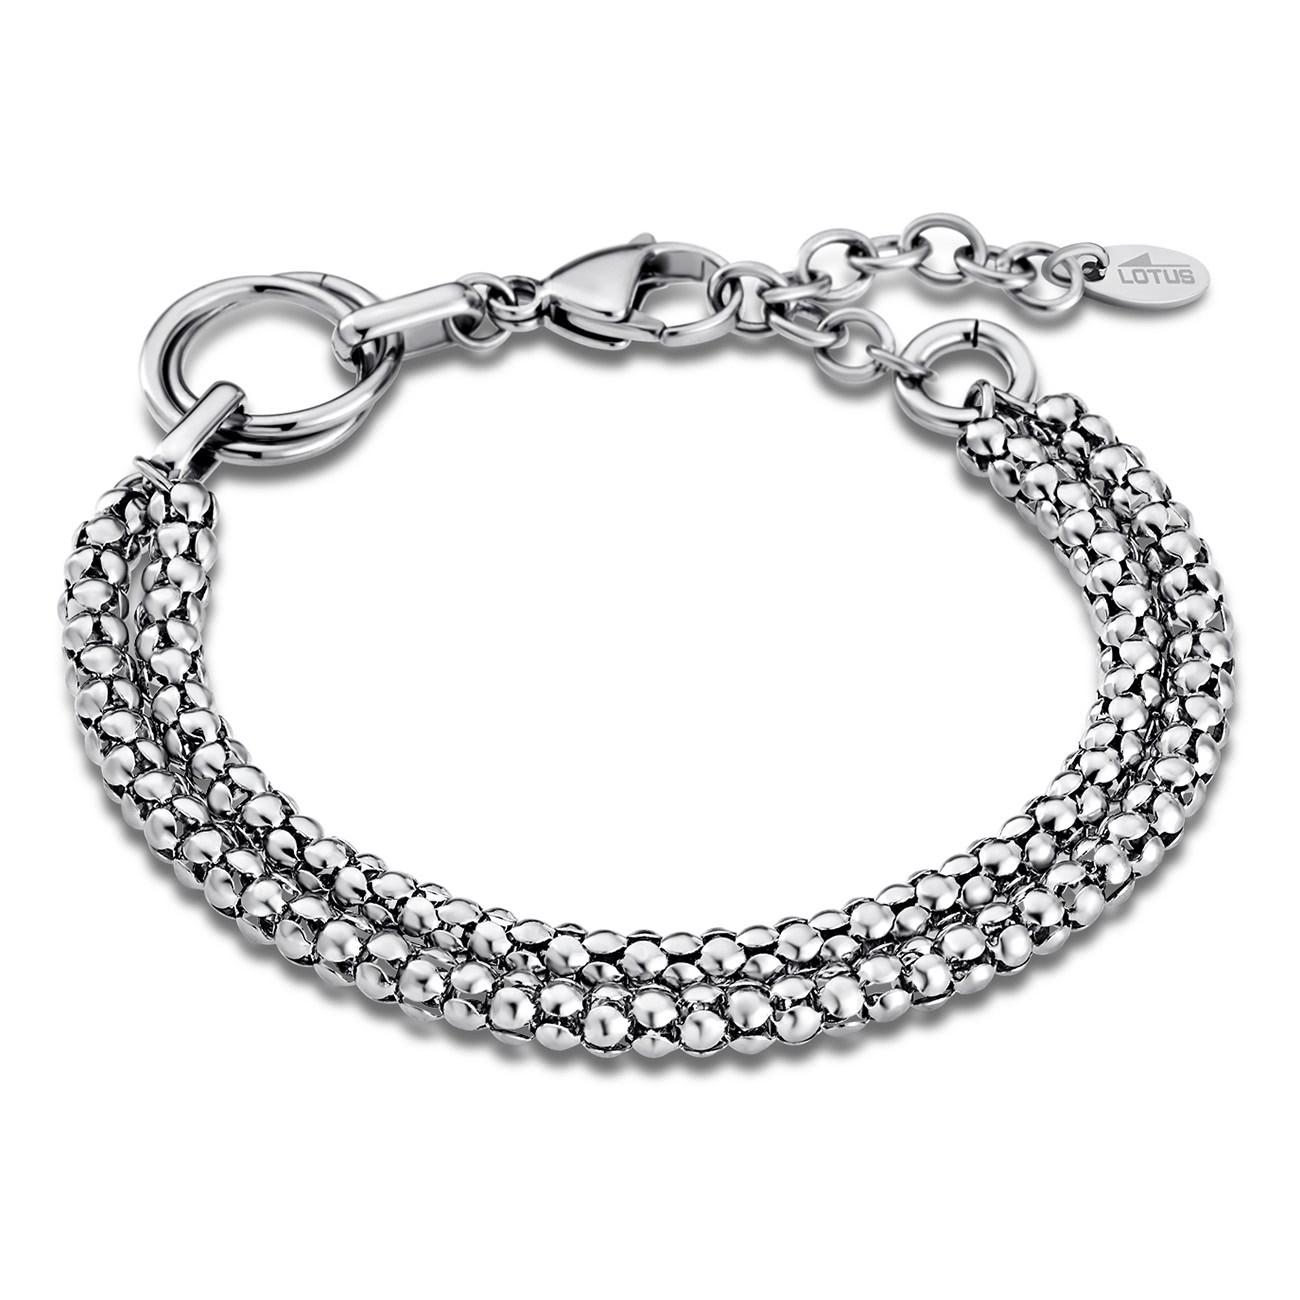 LOTUS Style Armband Damen Edelstahl silber LS1818-2/1 Woman Basic JLS1818-2-1